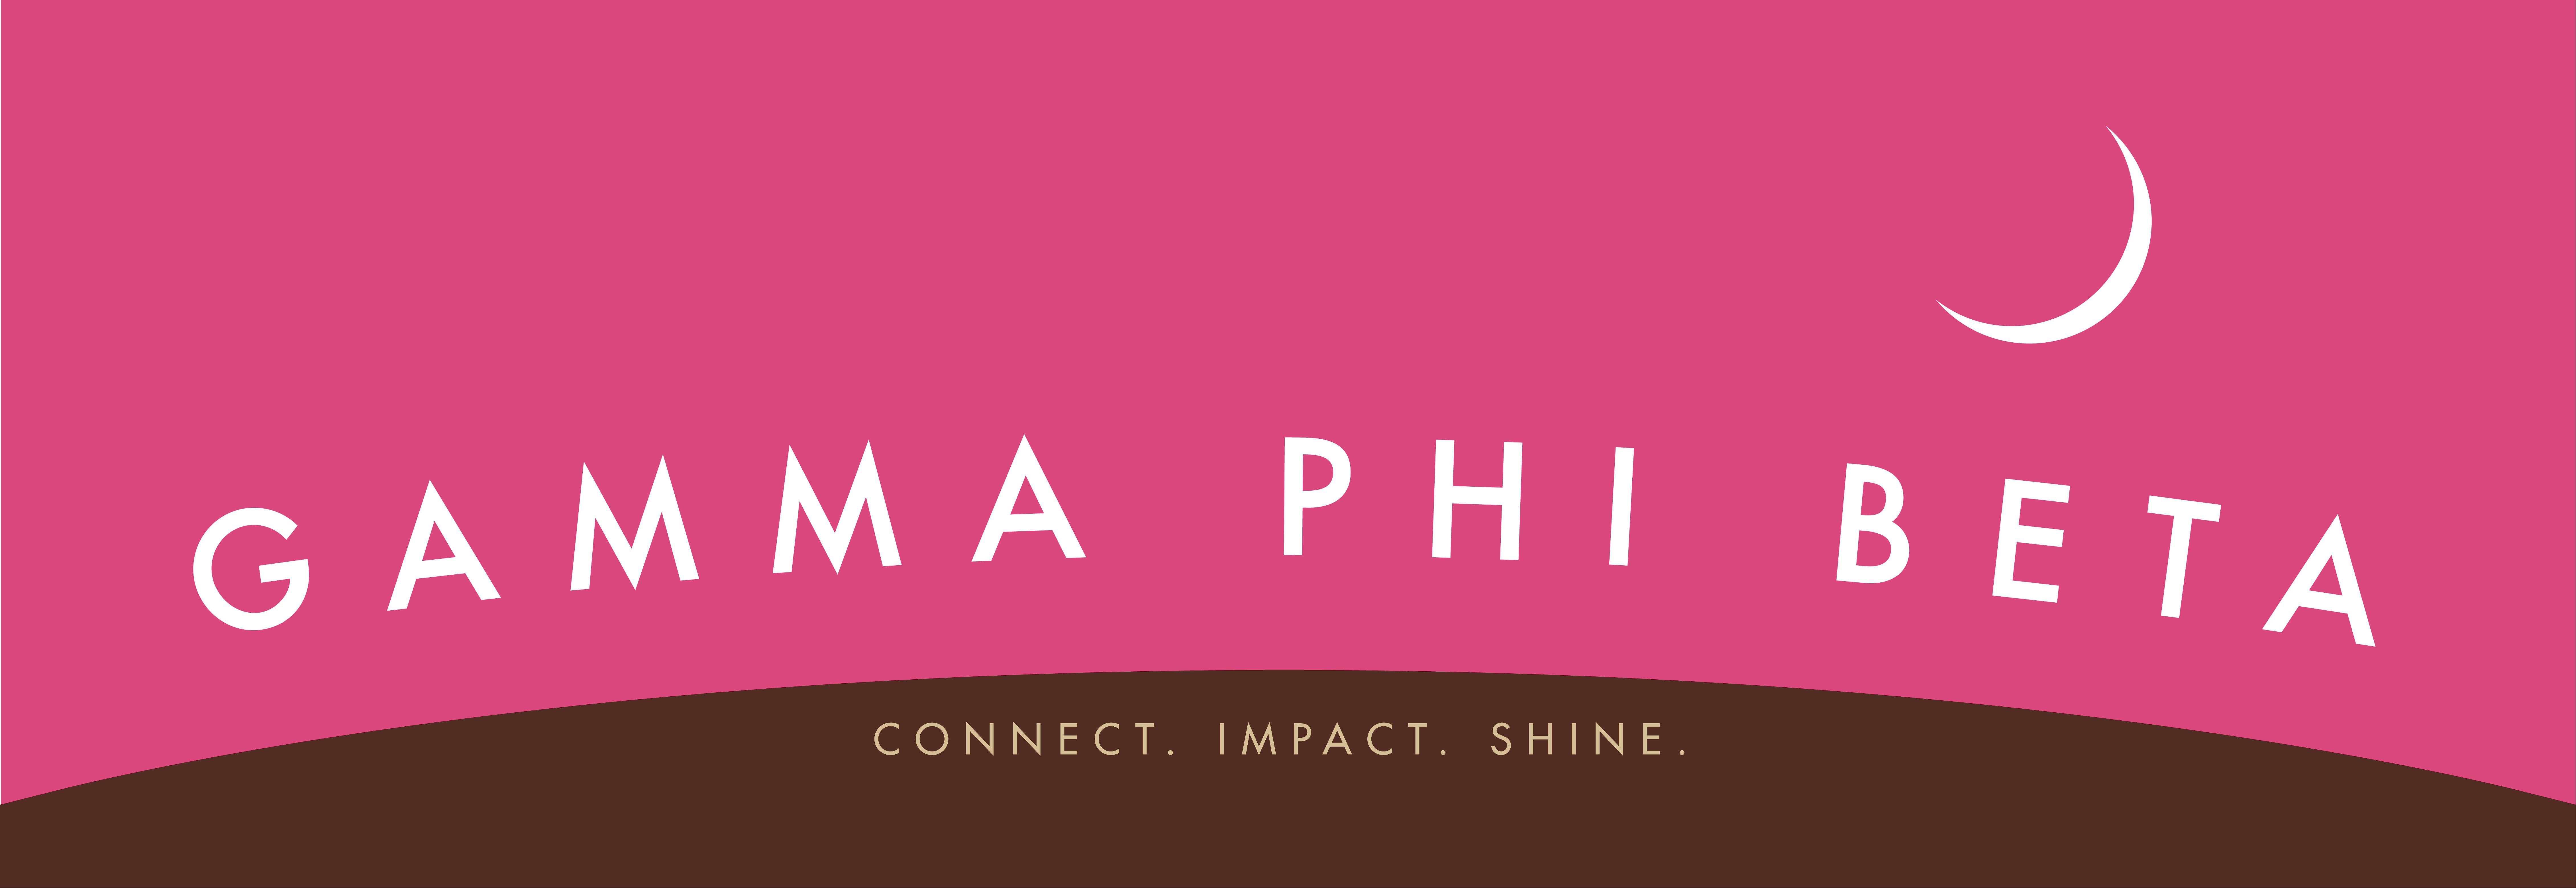 Lambda Chi Alpha Fraternity  Phi Sigma Zeta Chapter